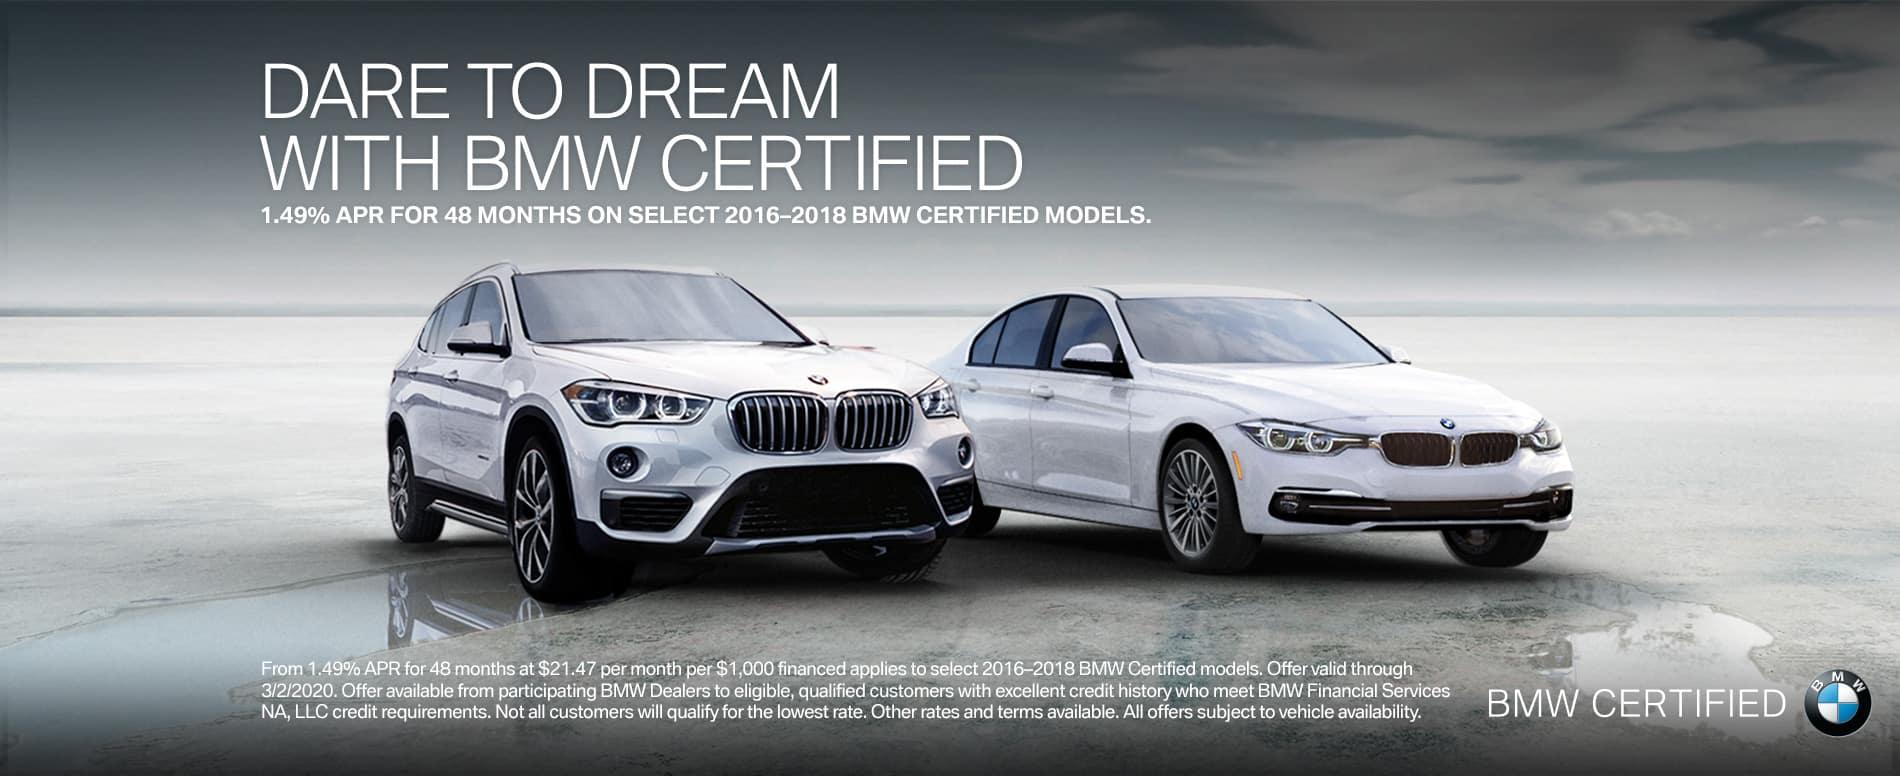 BMW Santa Barbara >> Bmw Santa Barbara Bmw Dealer In Santa Barbara Ca